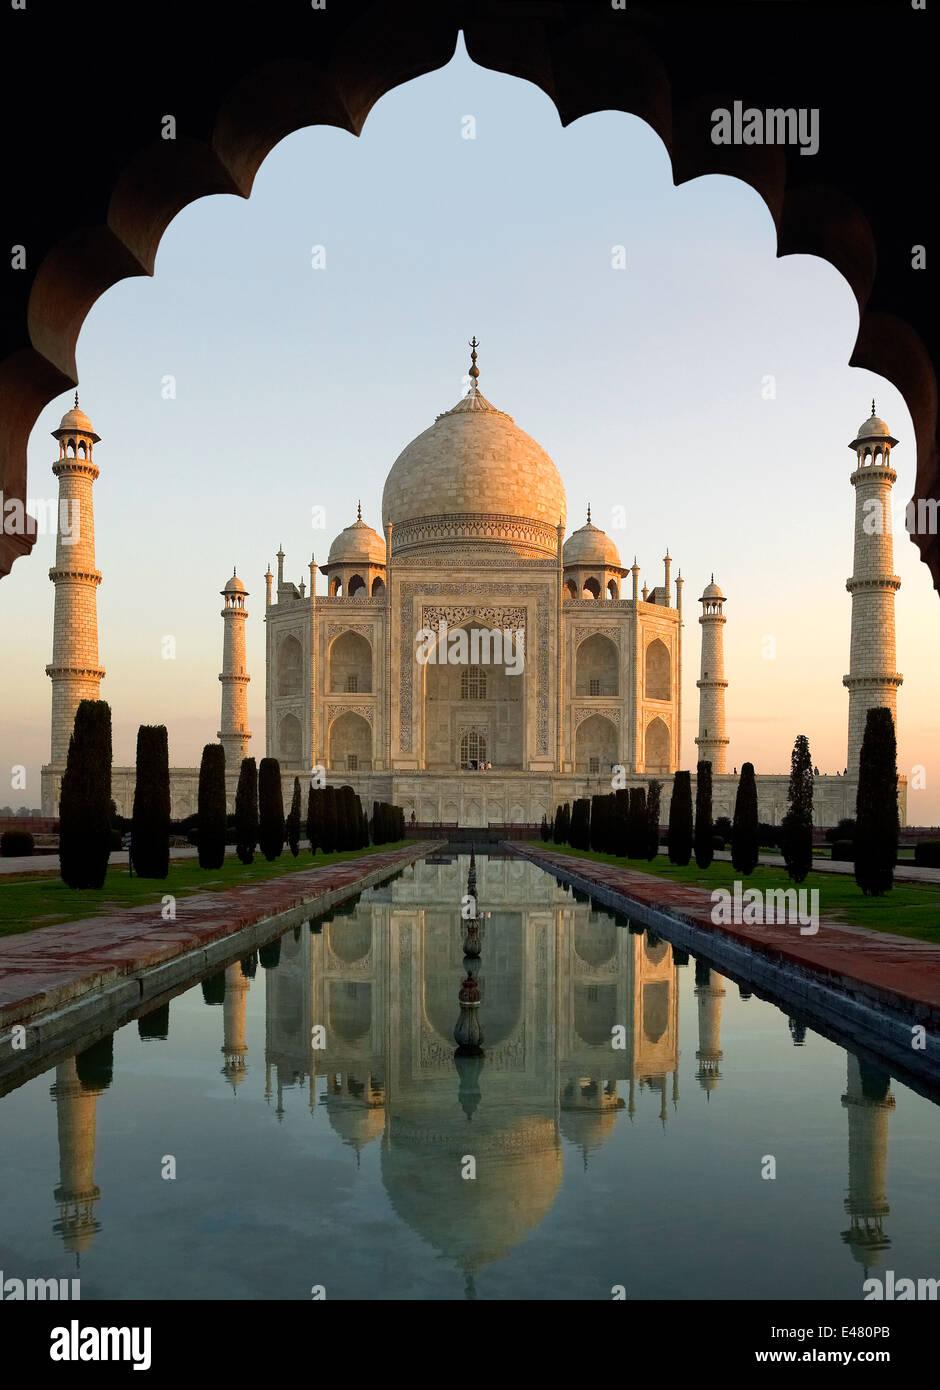 Taj Mahal al amanecer - Agra - India Imagen De Stock